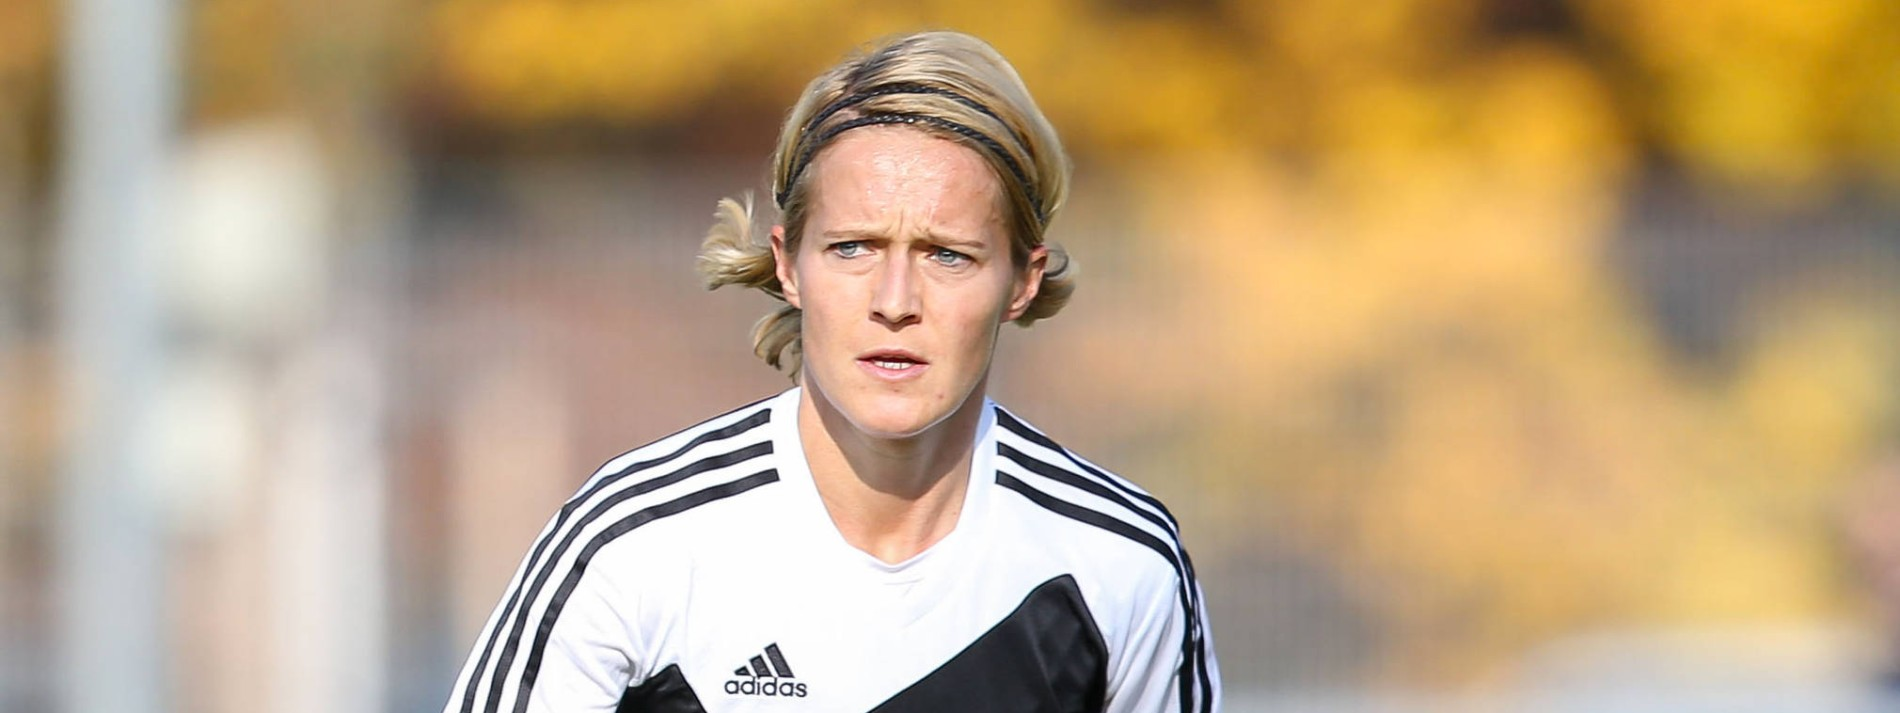 Olympiasiegerin Bartusiak beendet Fußball-Karriere